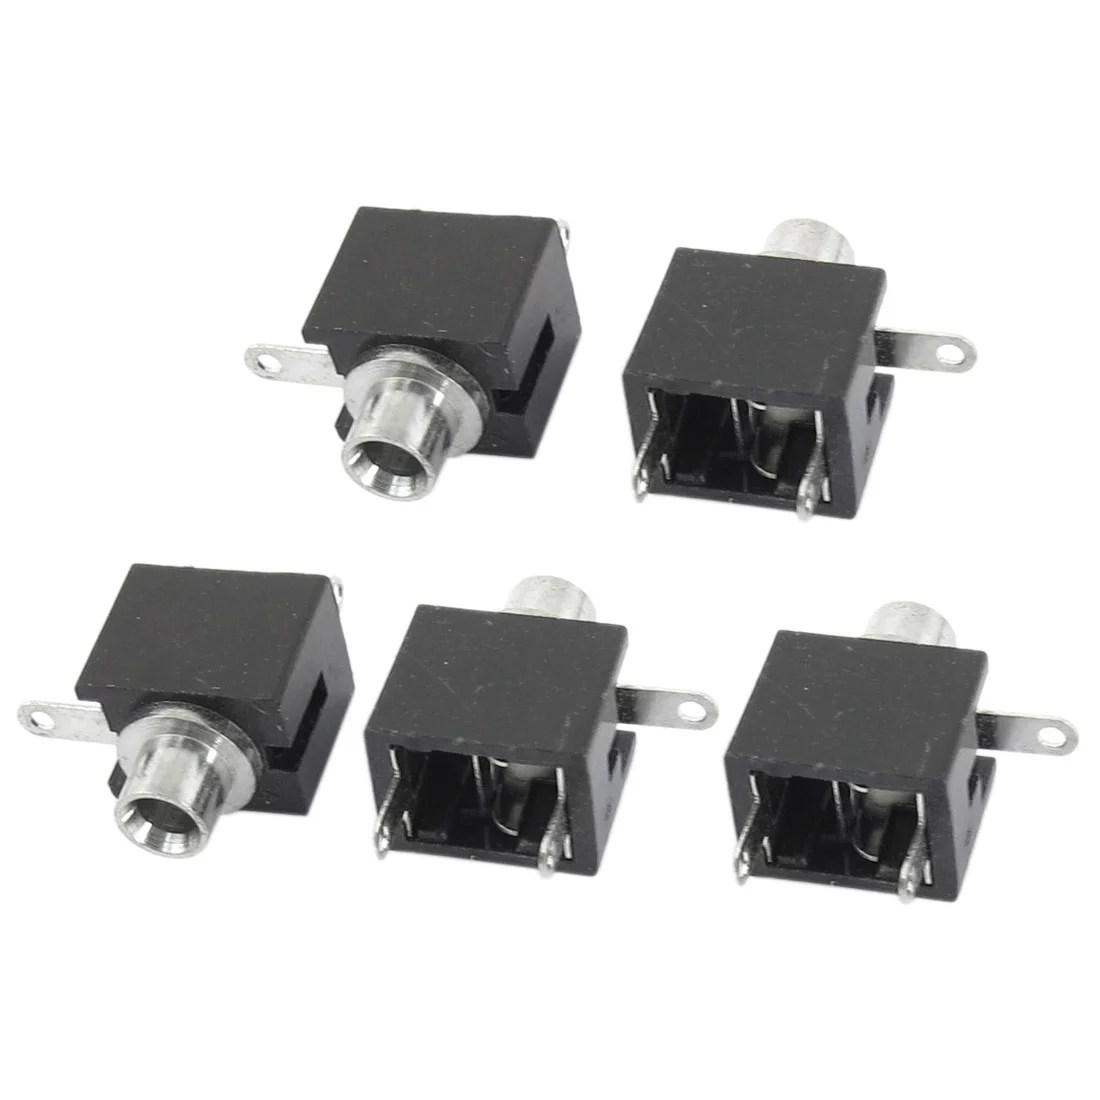 small resolution of 5pcs 3 5mm mono female socket audio jack soldering pcb panel mount5pcs 3 5mm mono female